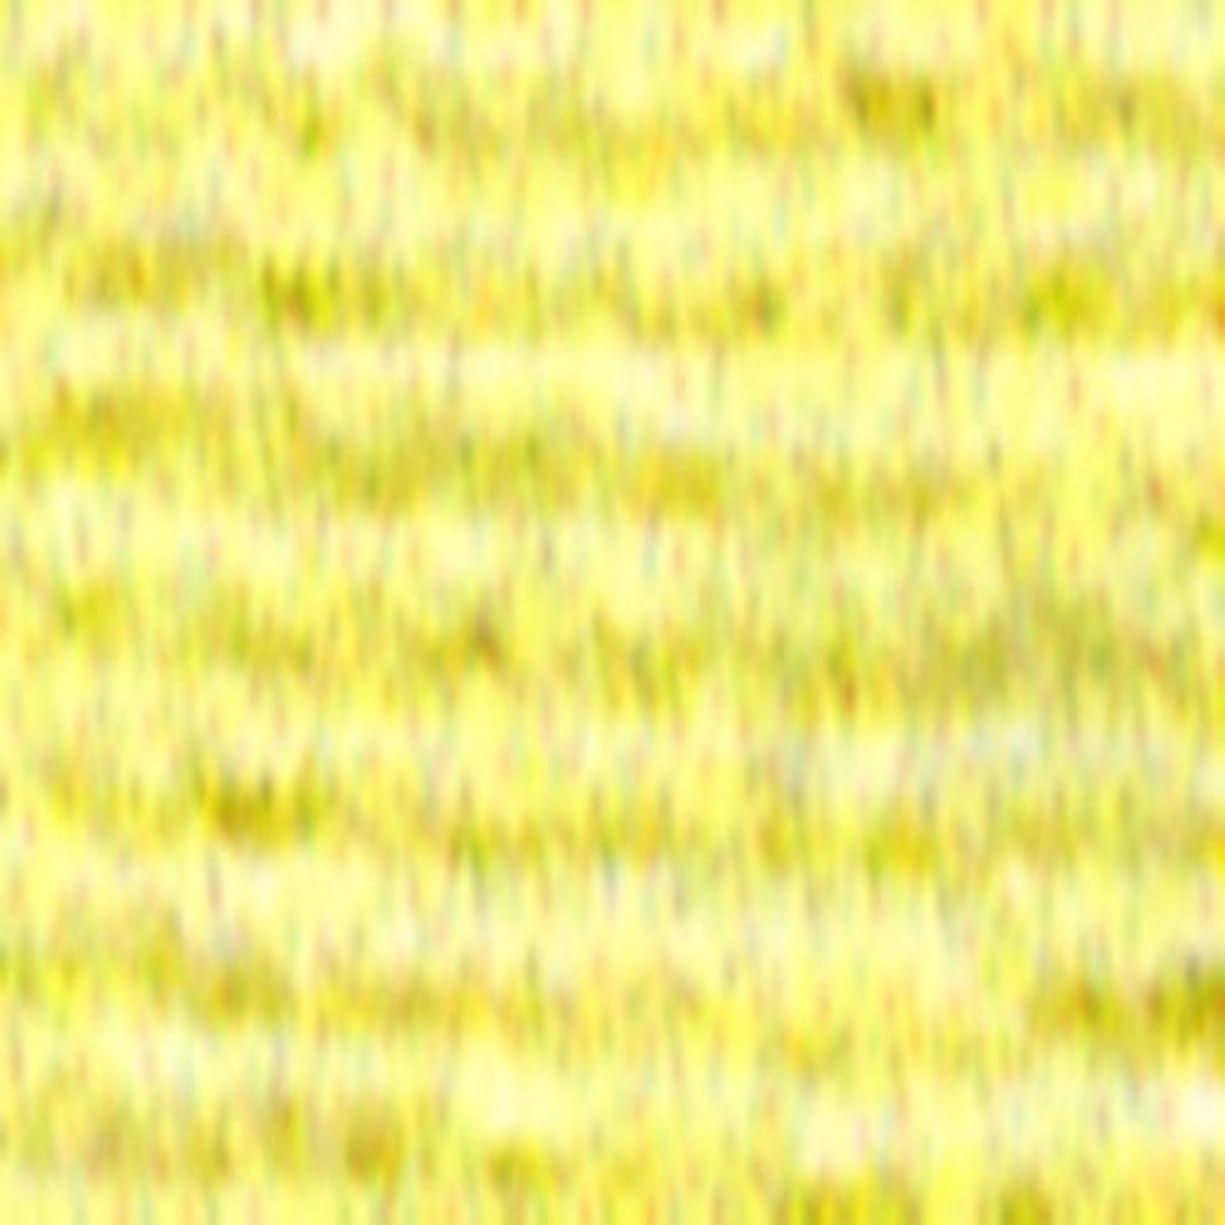 Sullivans Six Strand Embroidery Cotton 8.7 Yards-Light Lemon 12 per Box